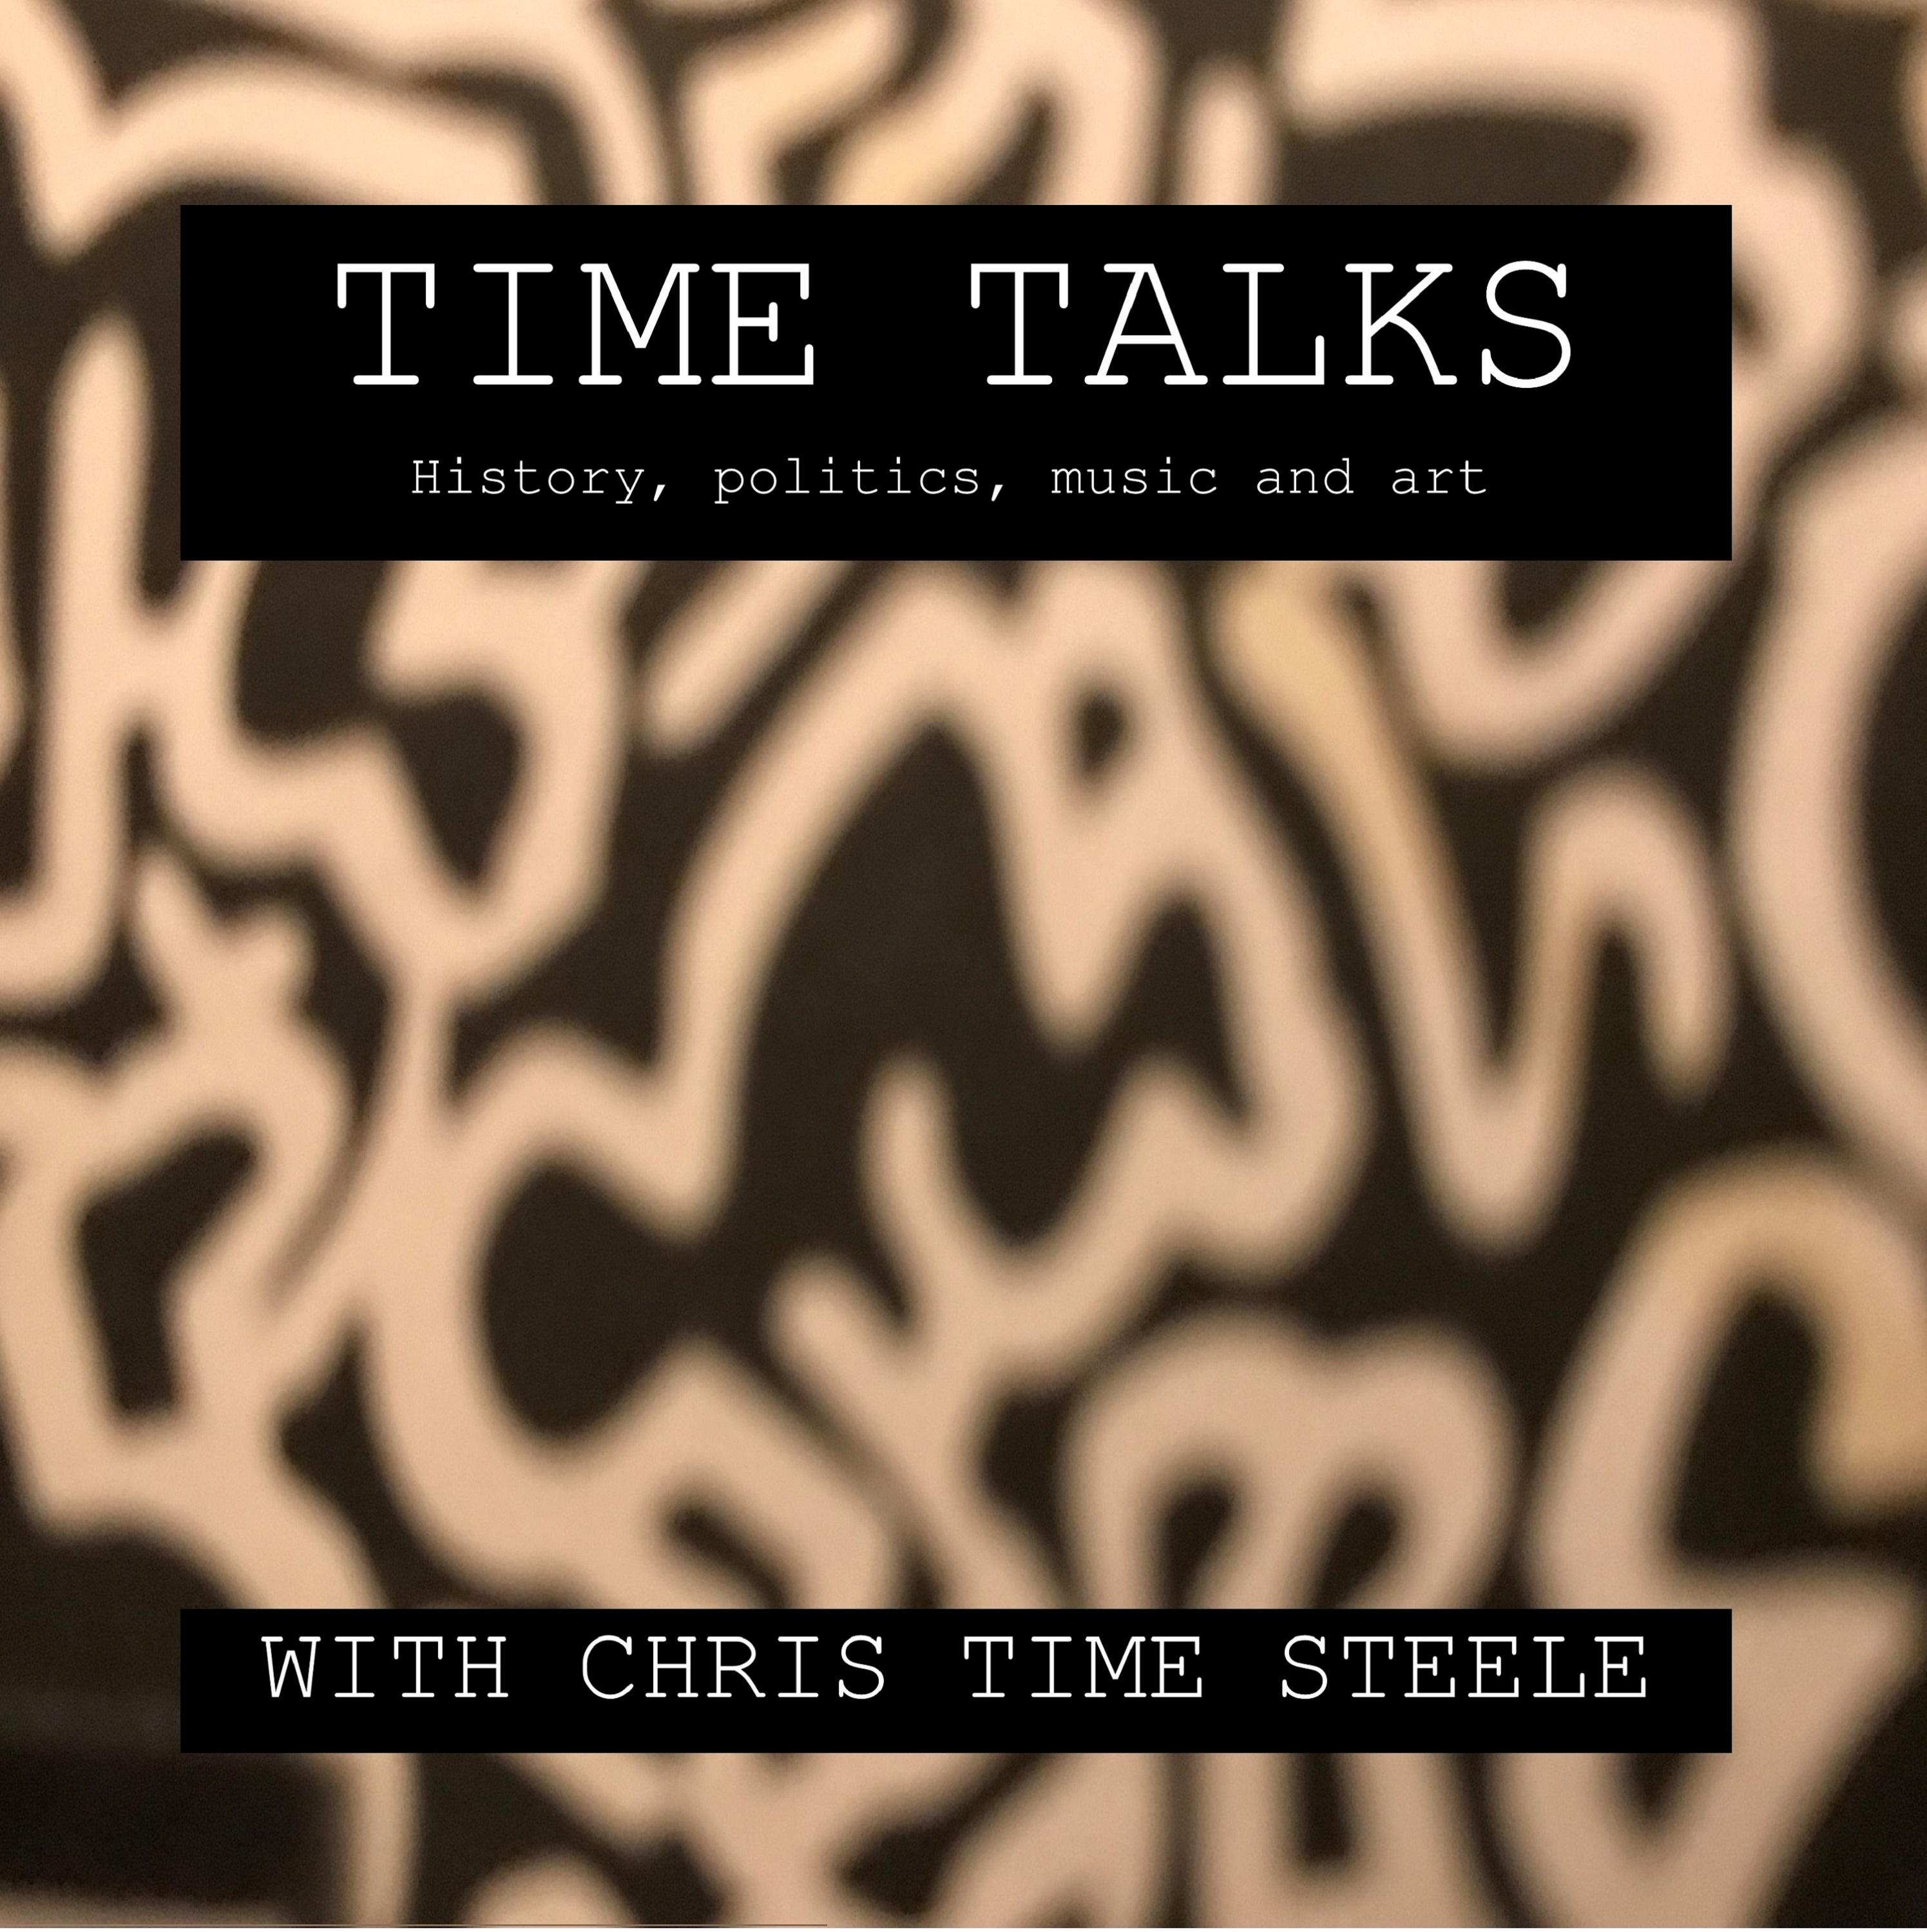 Time Talks: History, Politics, Music, and Art show art